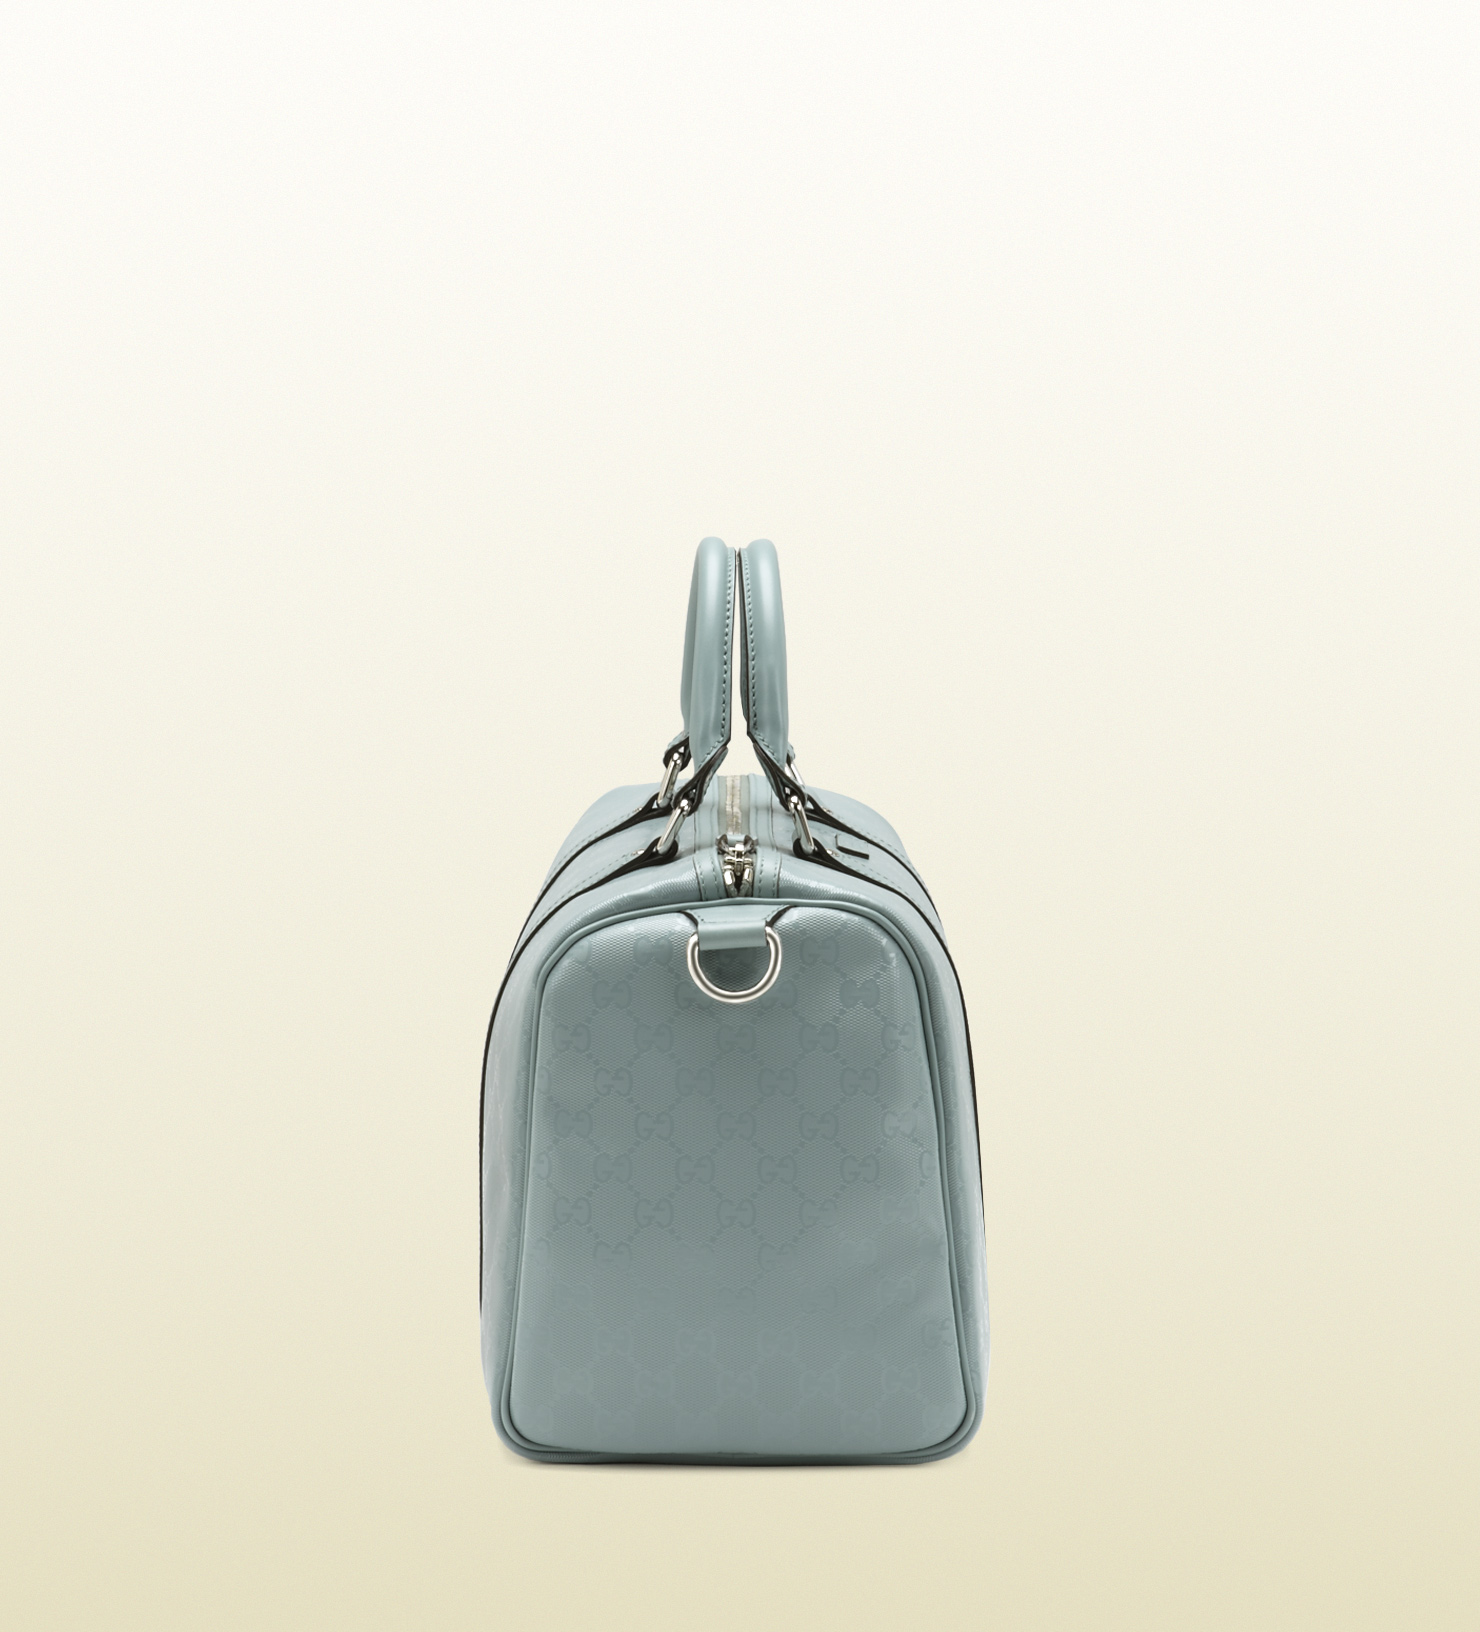 20470e8b4 Gucci Joy Light Blue Gg Imprimé Boston Bag in Blue - Lyst